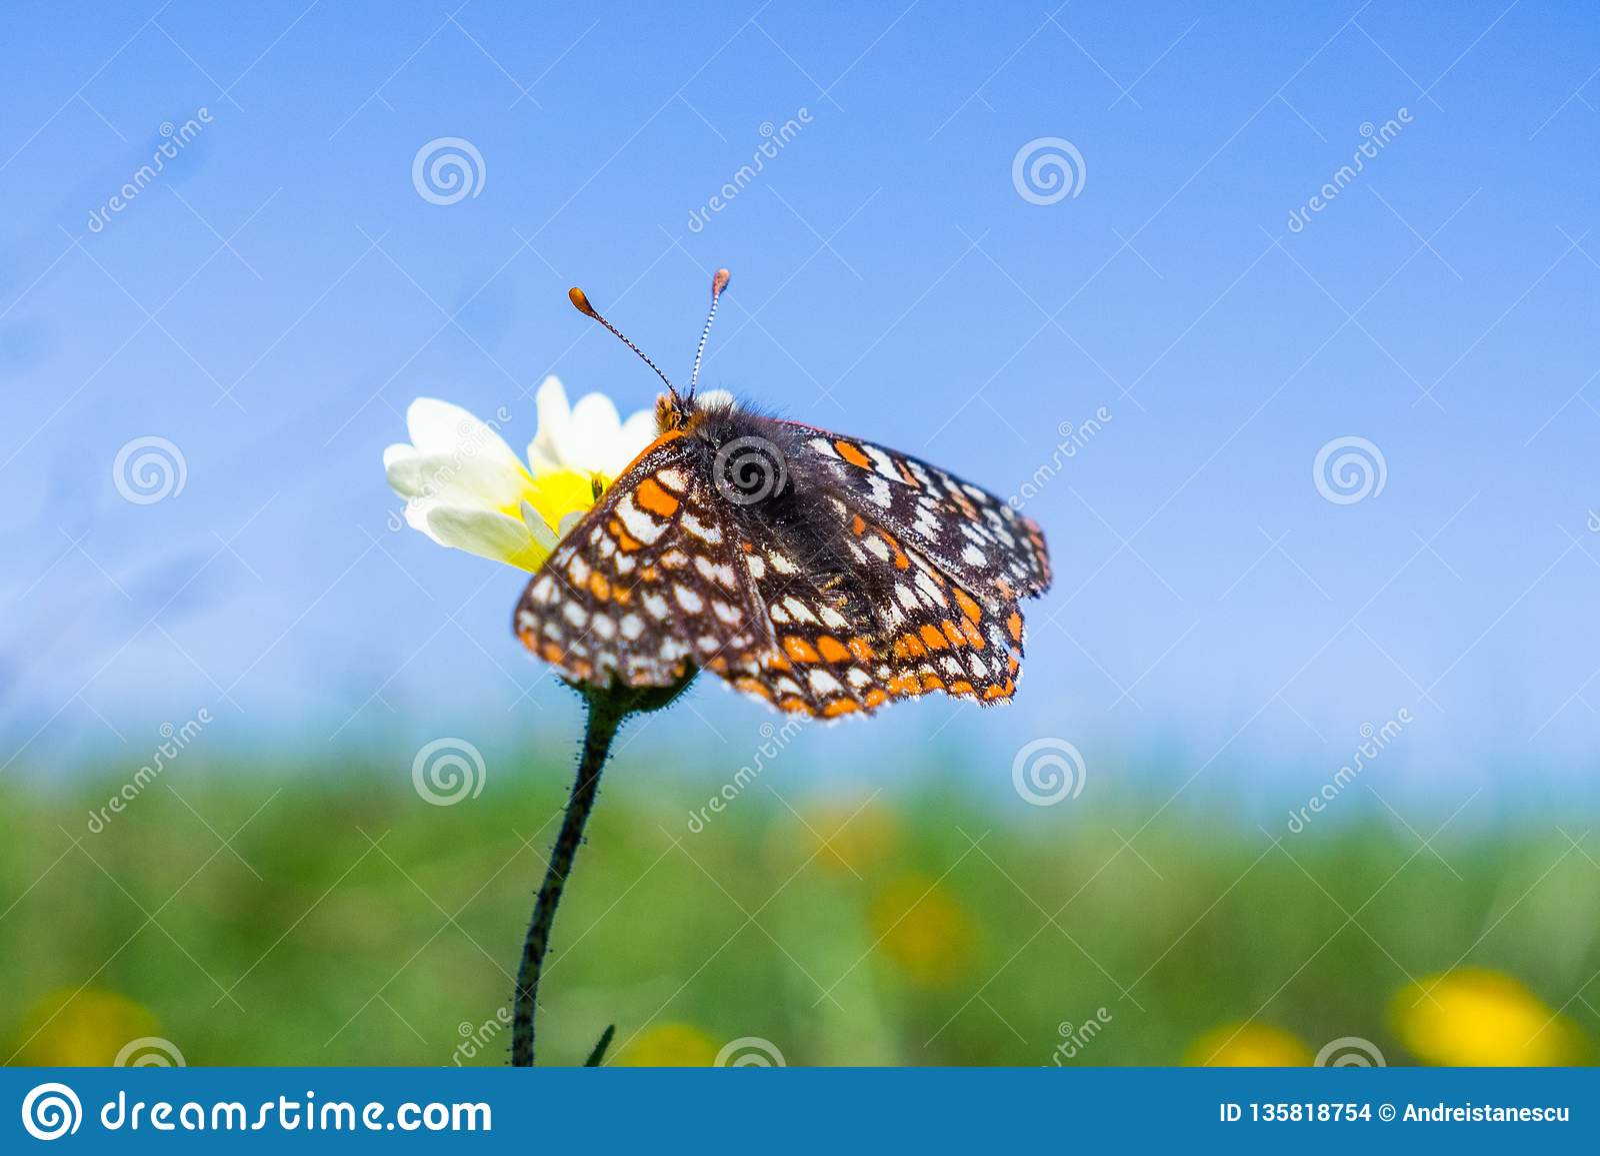 海湾Checkerspot蝴蝶(Euphydryas editha bayensis)在宽舌莱氏菊(Layia platyglossa)野花;分类为a联邦